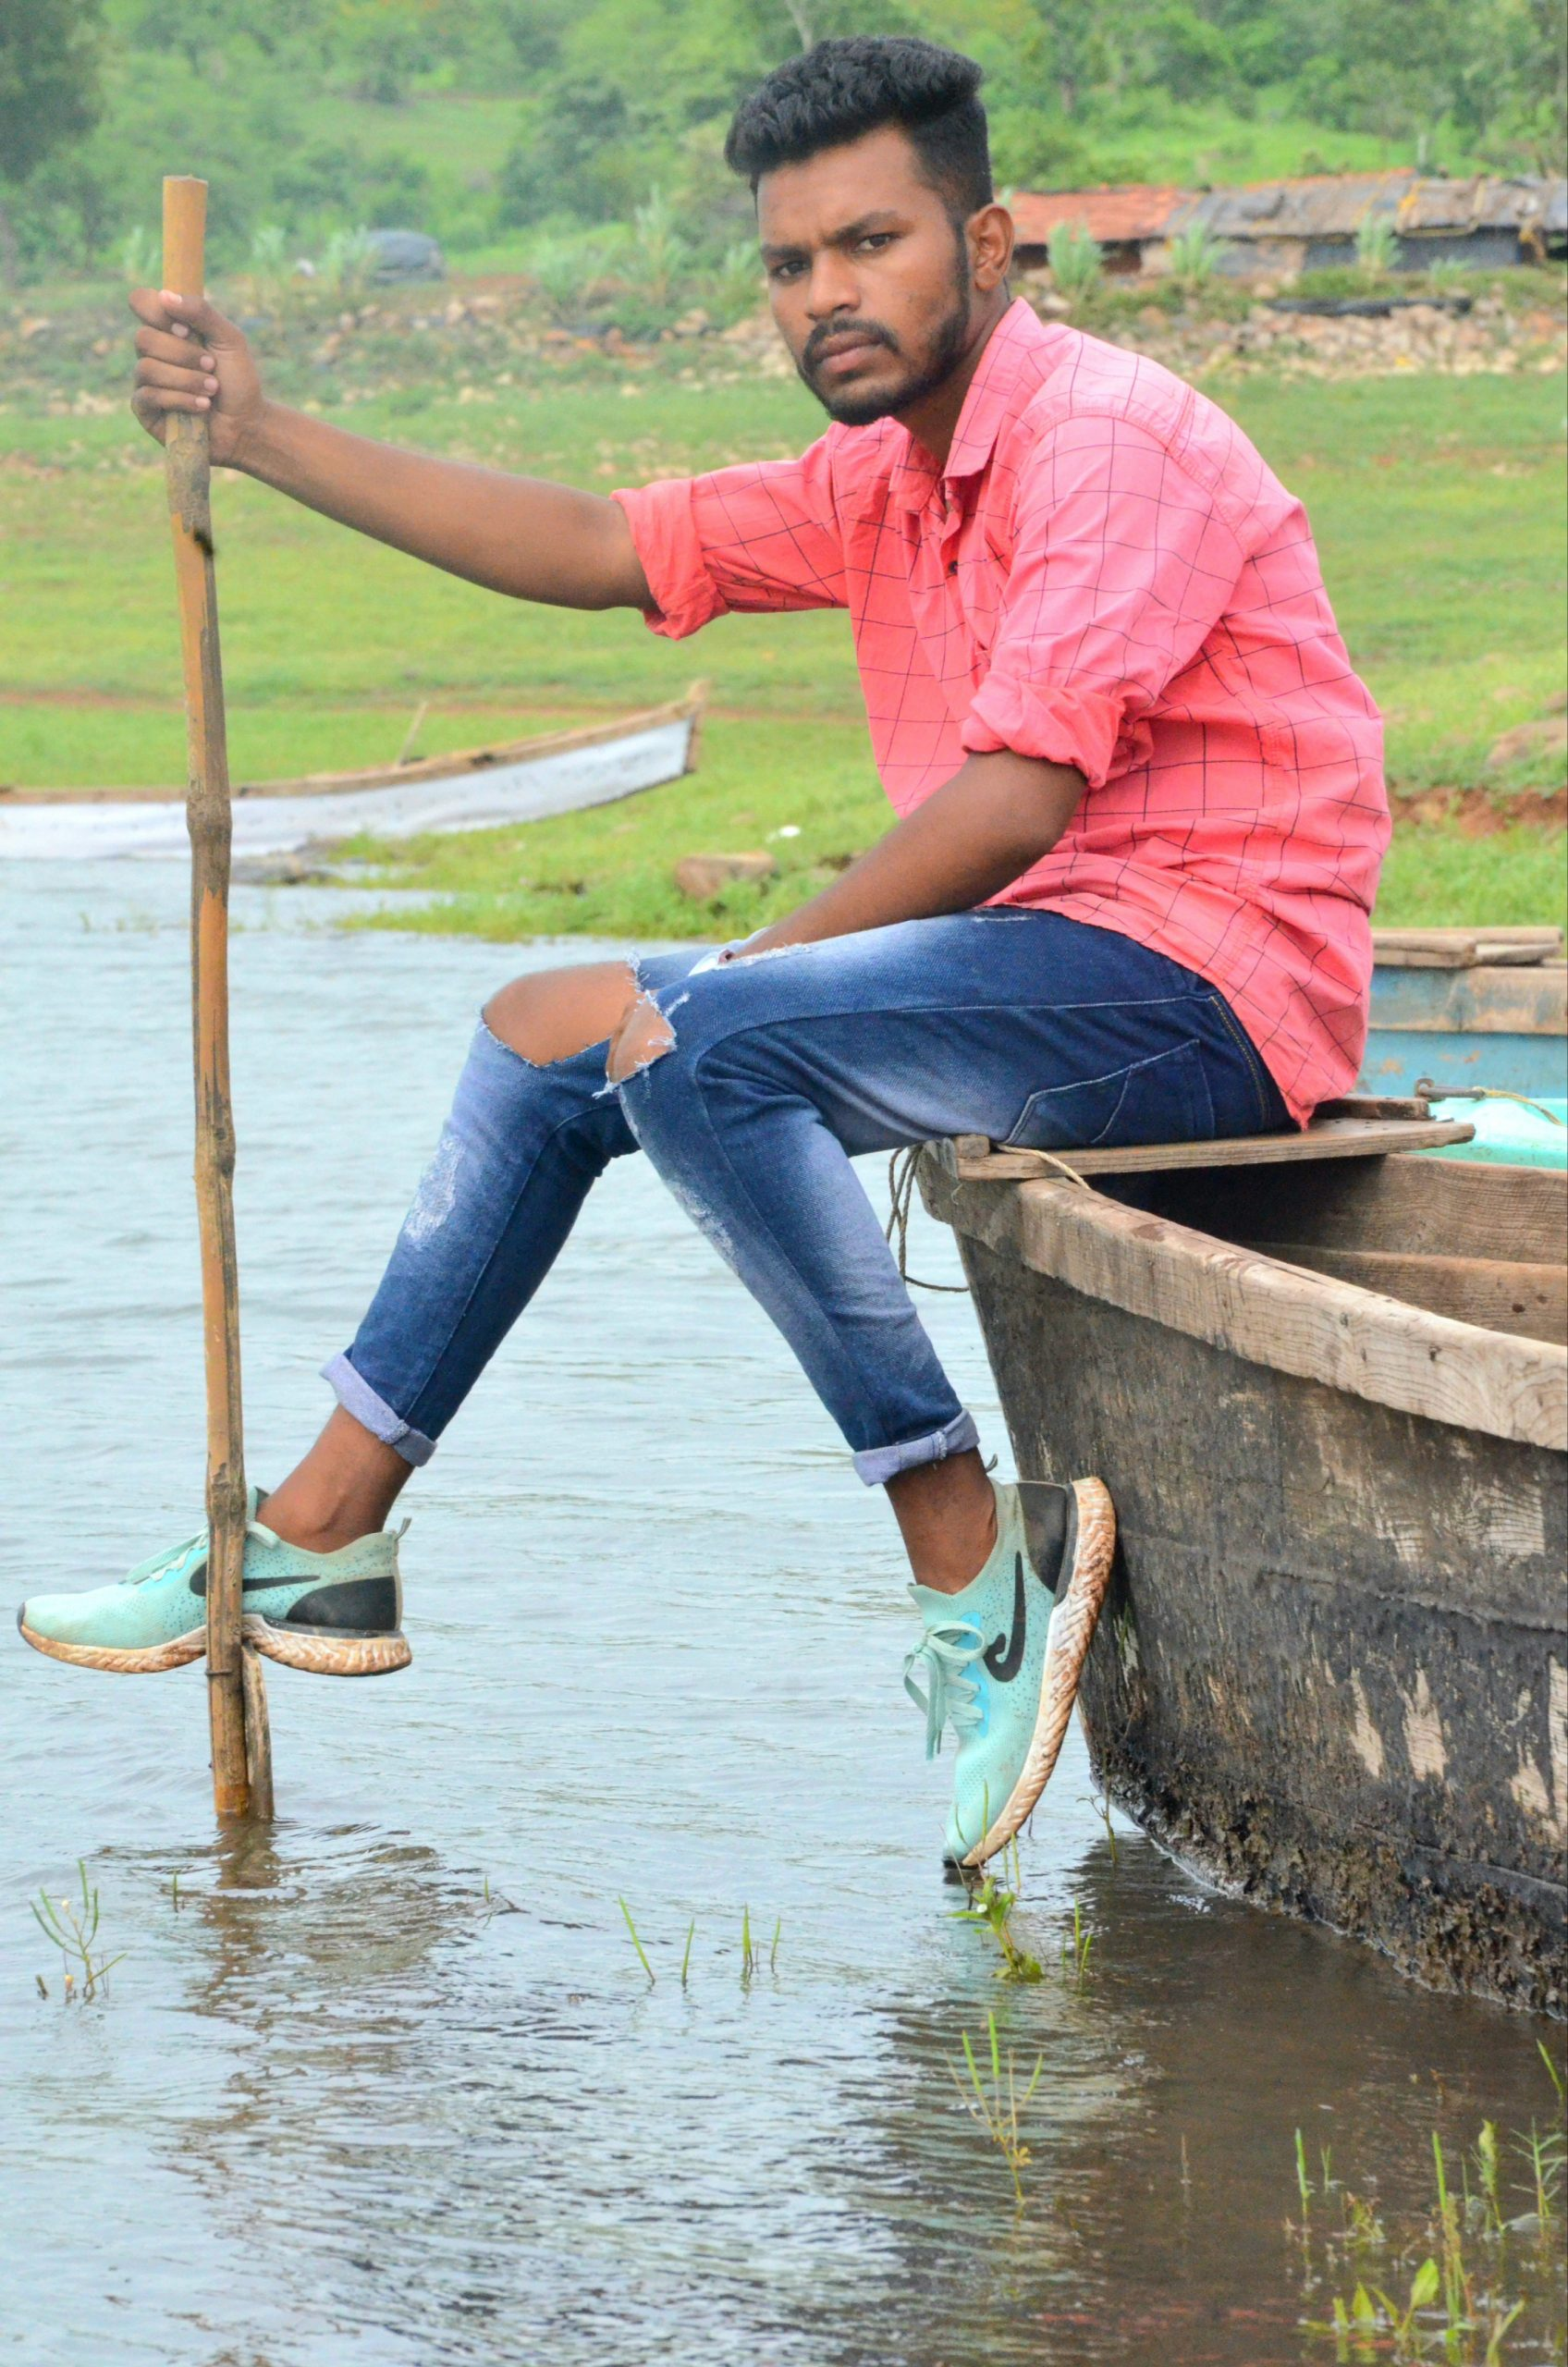 A boy on a boat